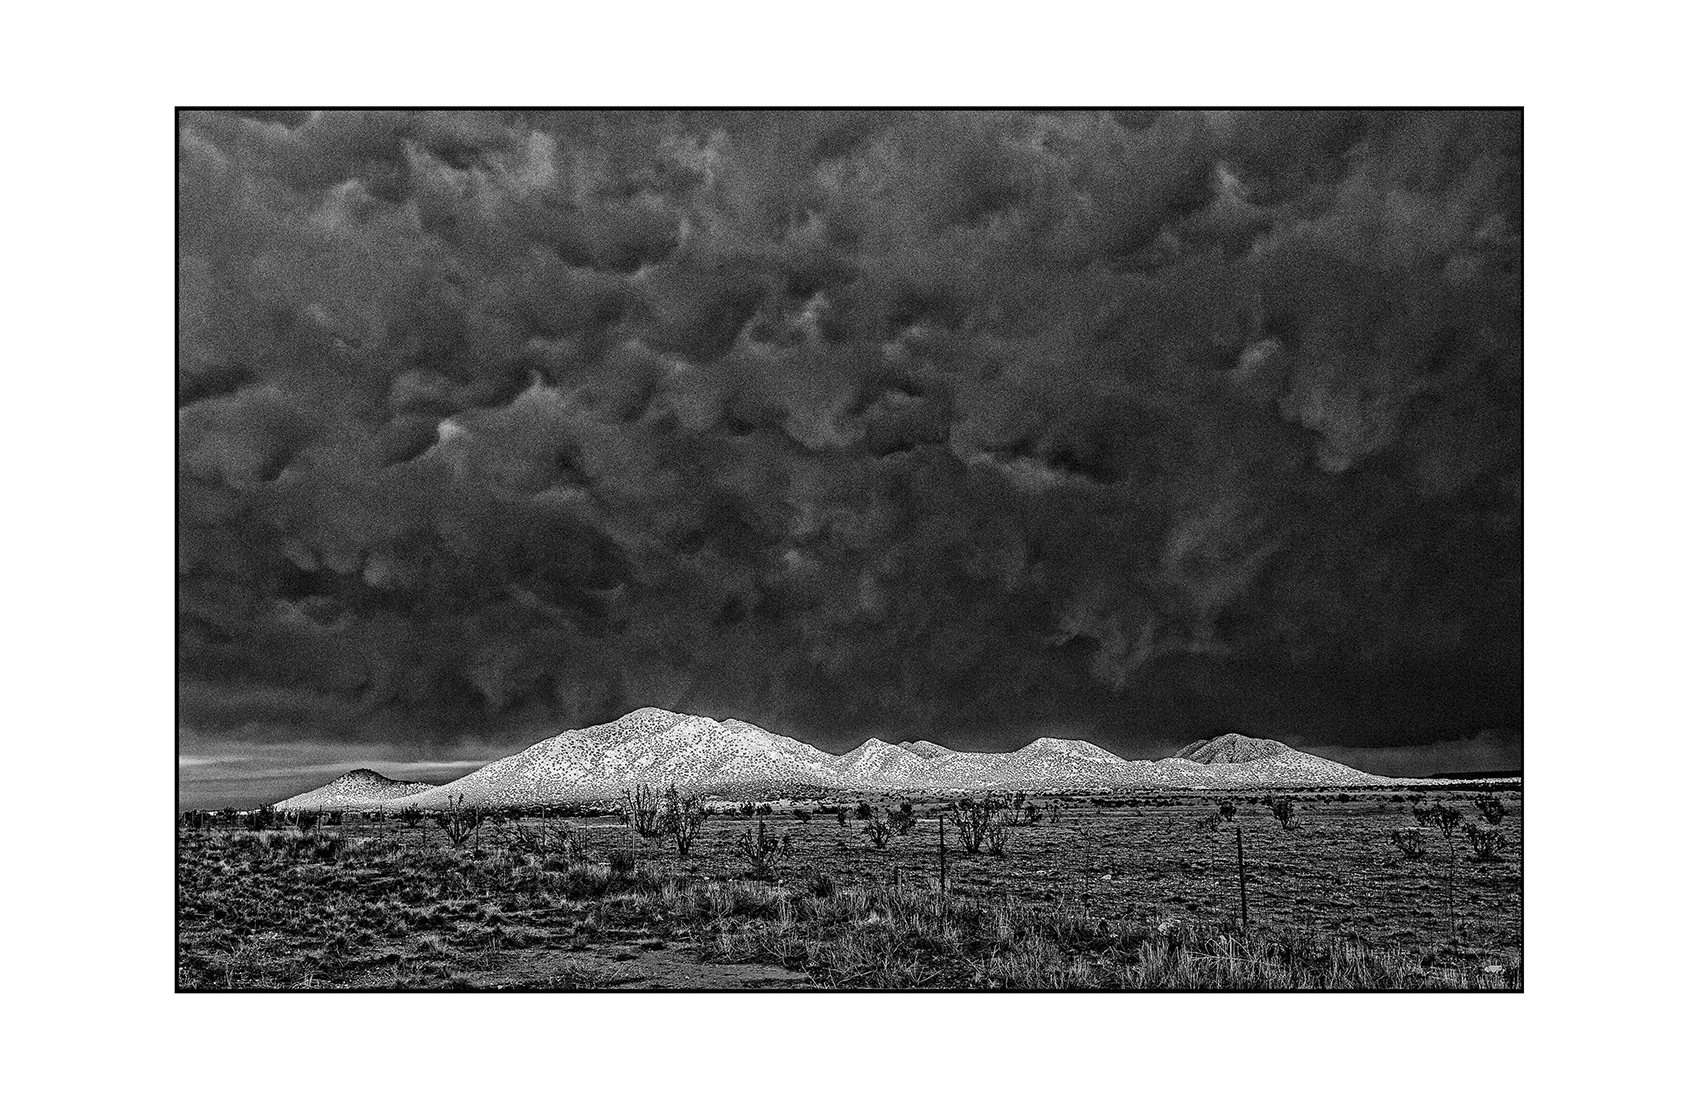 Storm above Los Cerrillos, NM.